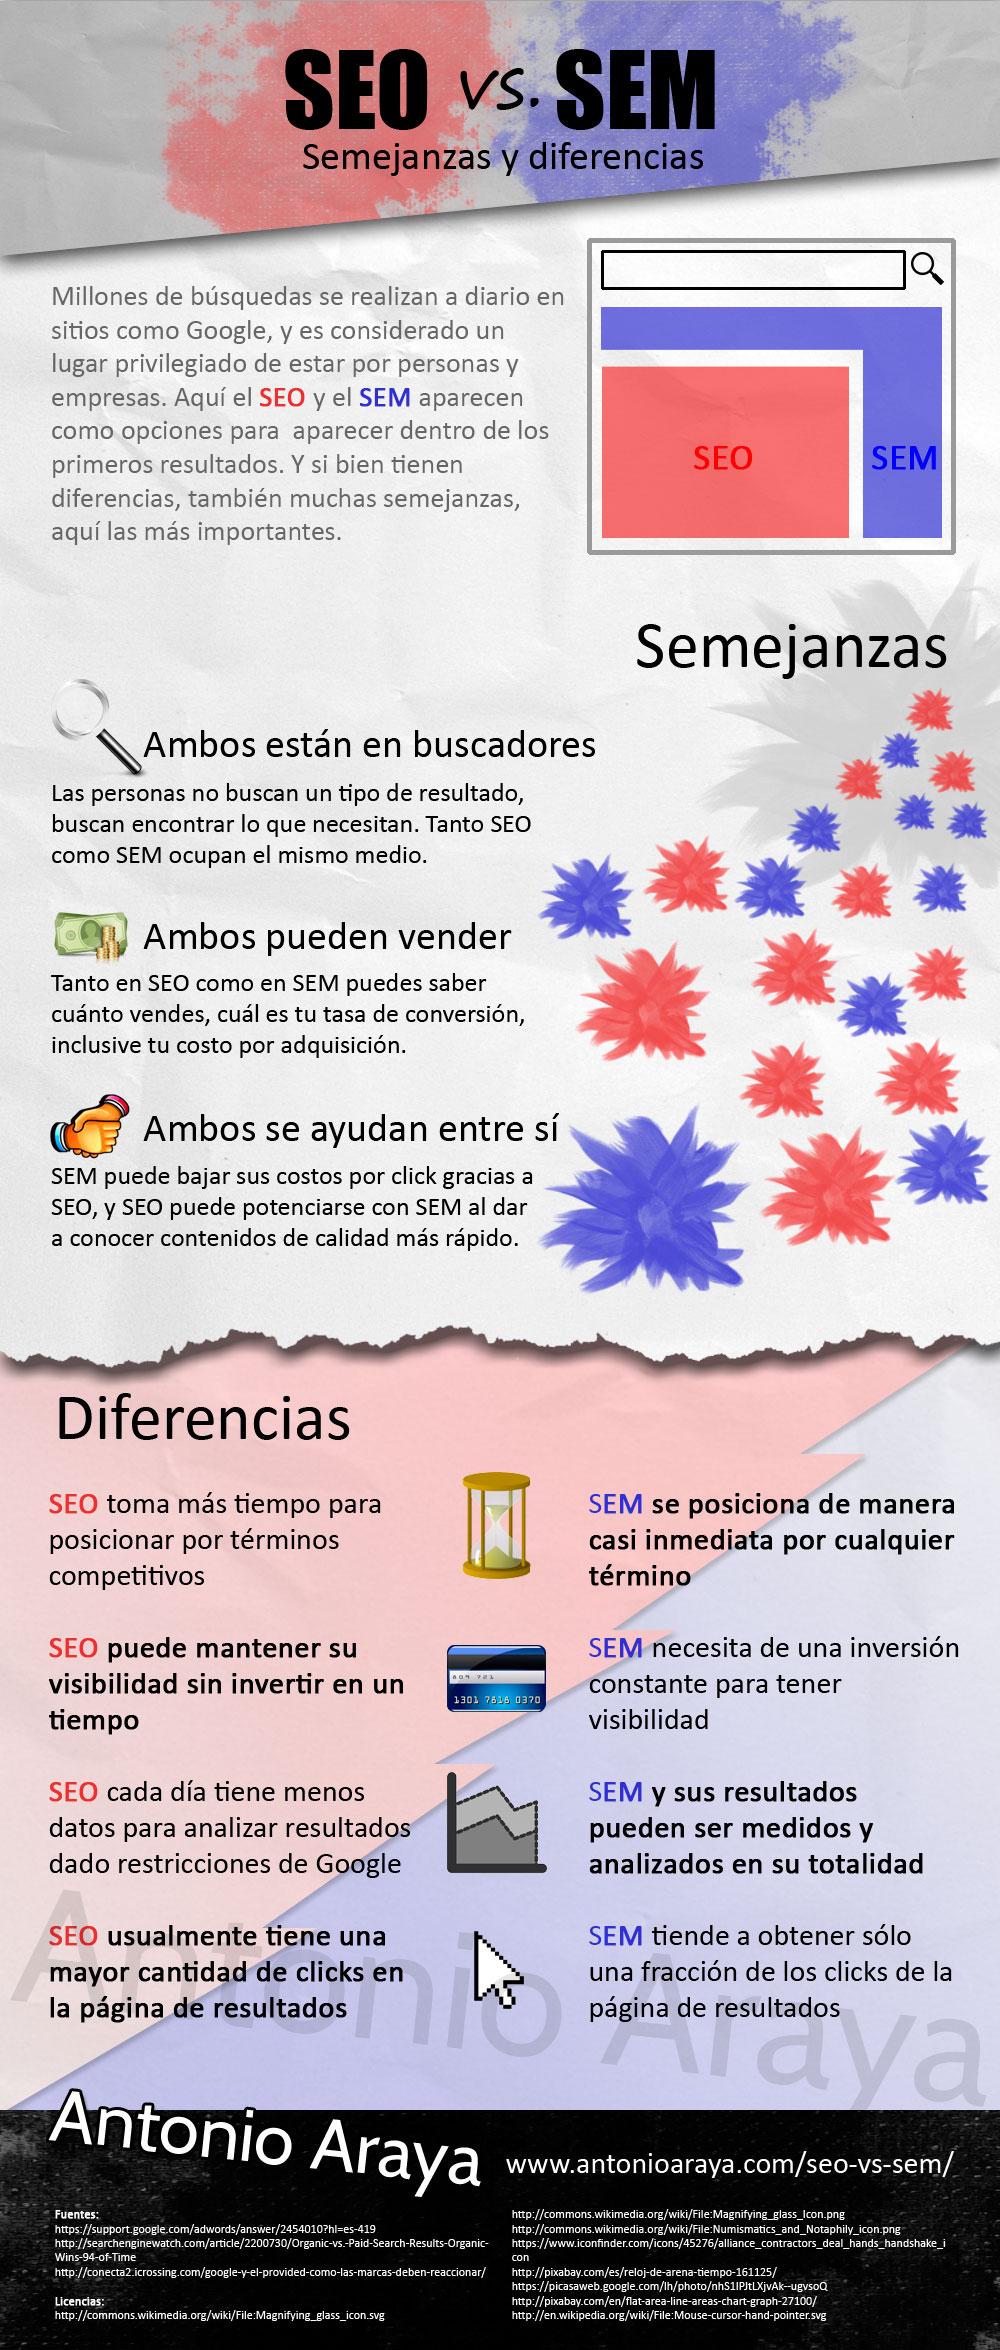 SEO vs SEM: semejanzas y diferencias infografia infographic seo